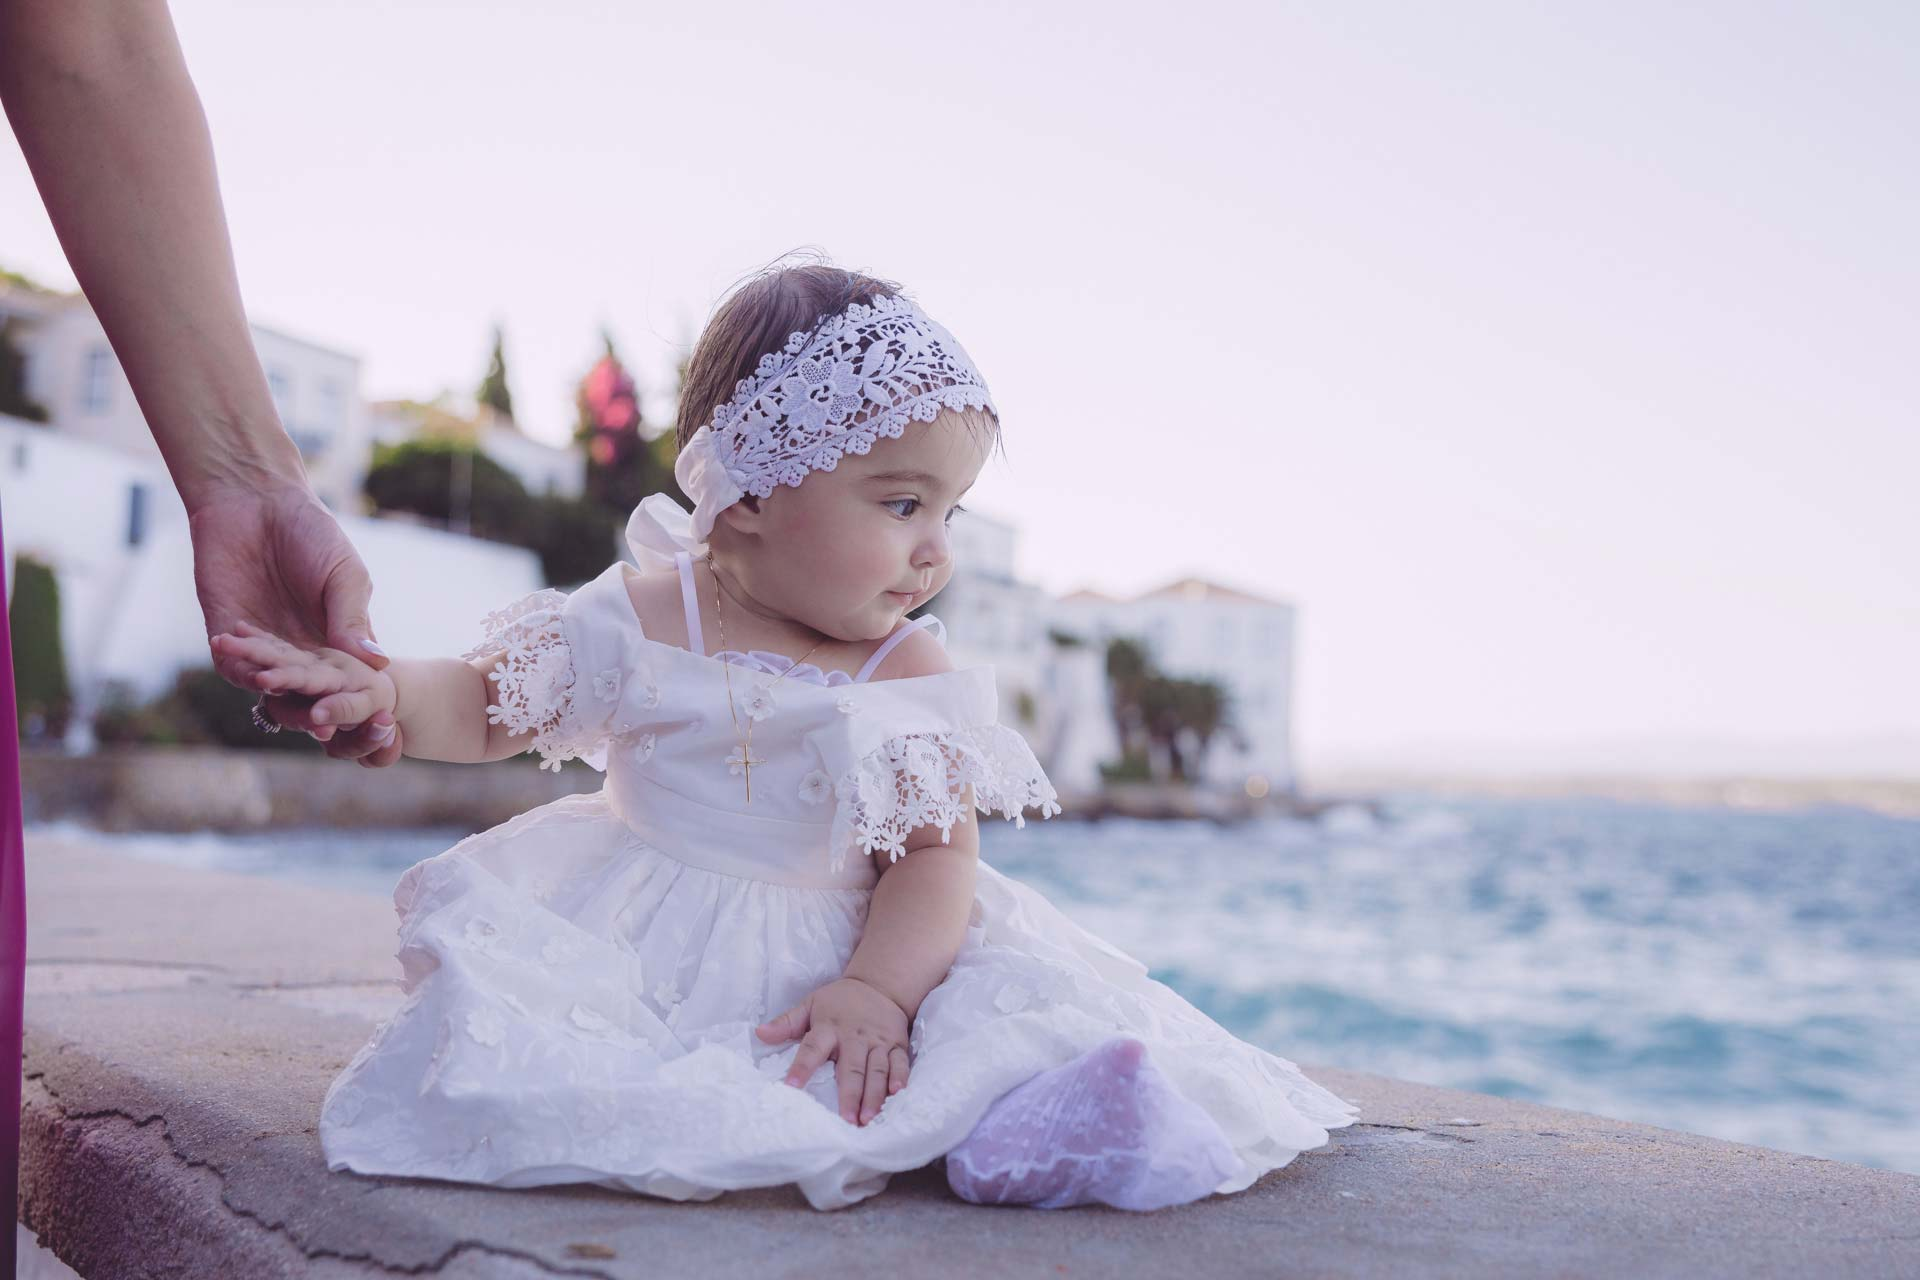 447 PhotoVaptisis βαπτιση σπετσεσ φωτογραφοσ vaptisi koritsi agios nikolaos spestes island photographer